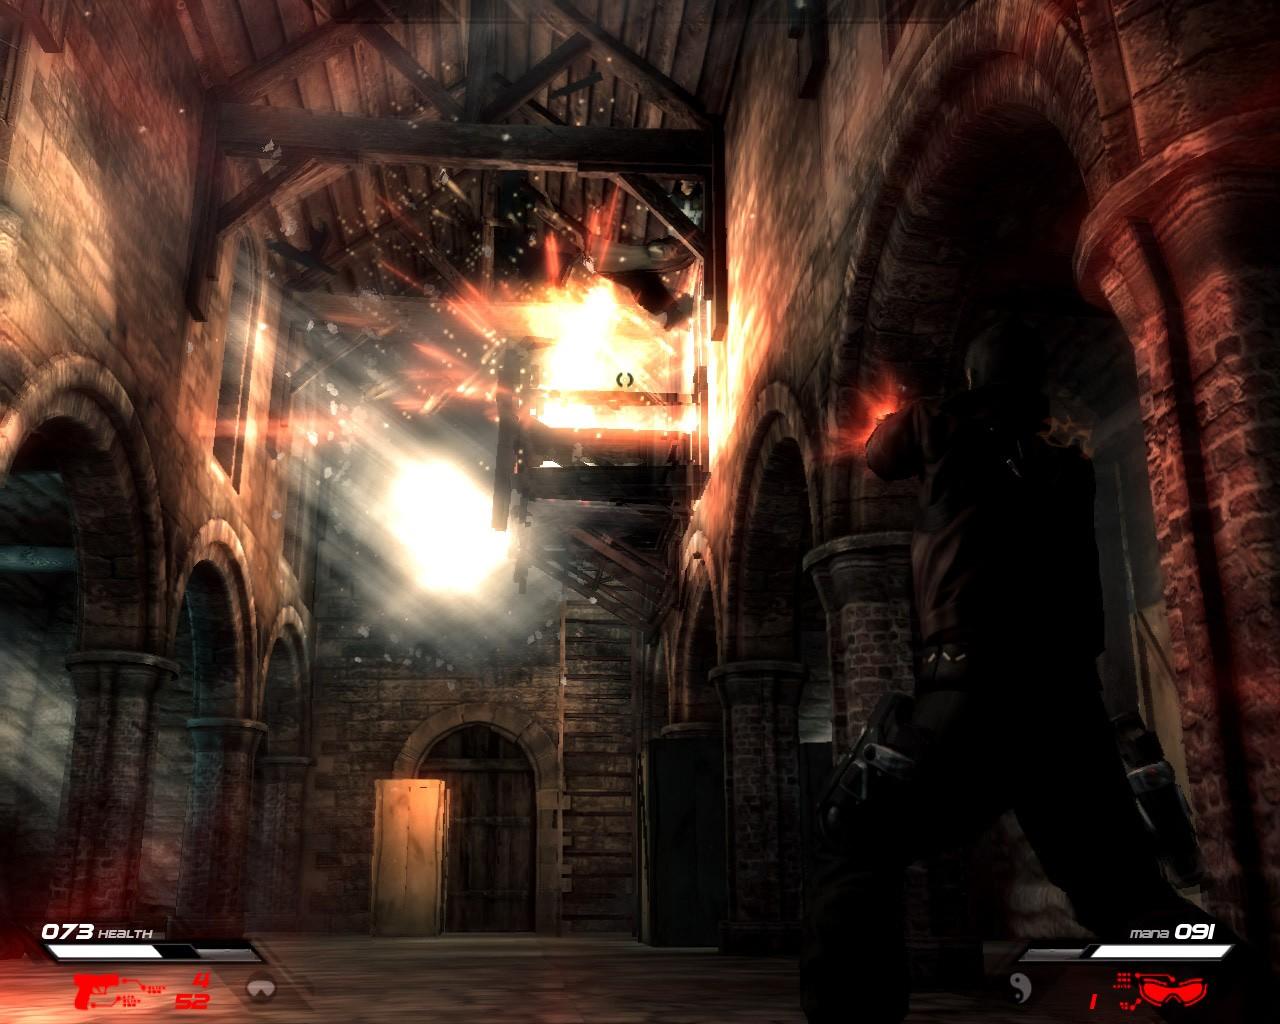 Infernal: Hells Vengeance - Sparatoria nel castello